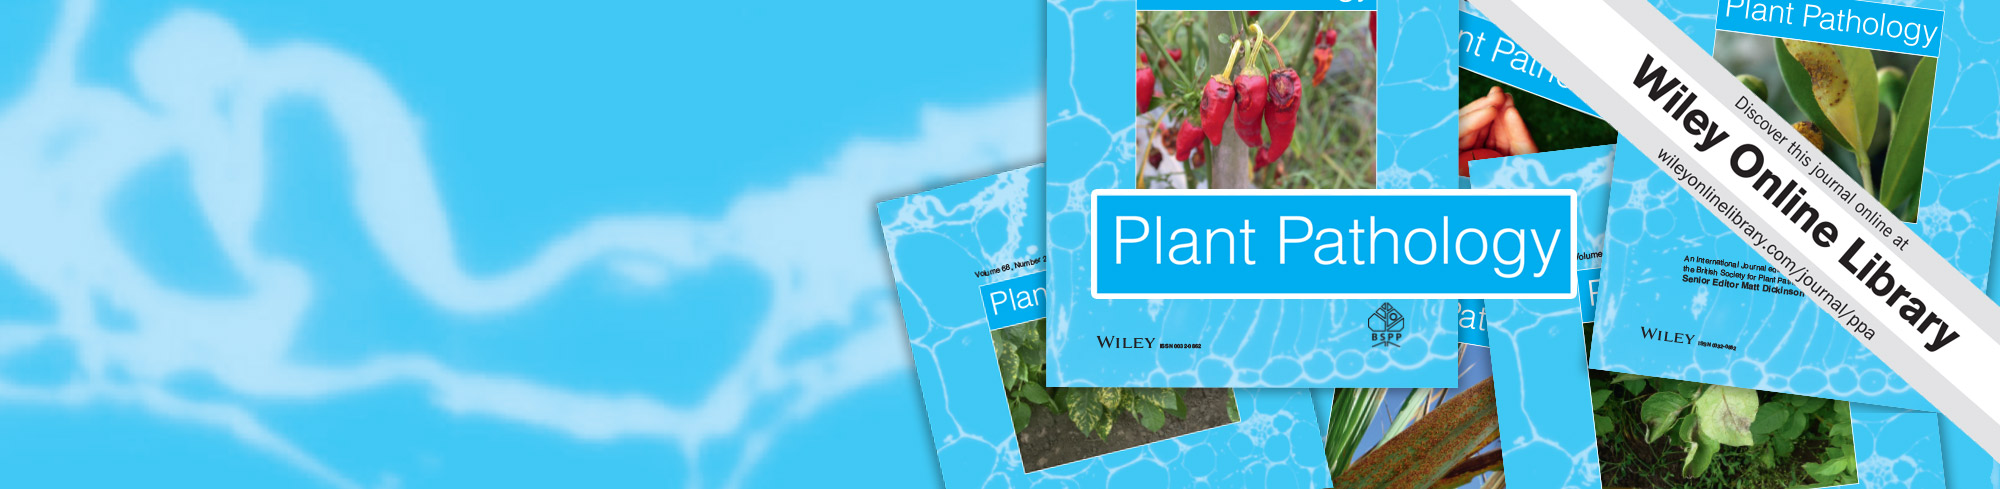 Plant Pathology – BSPP